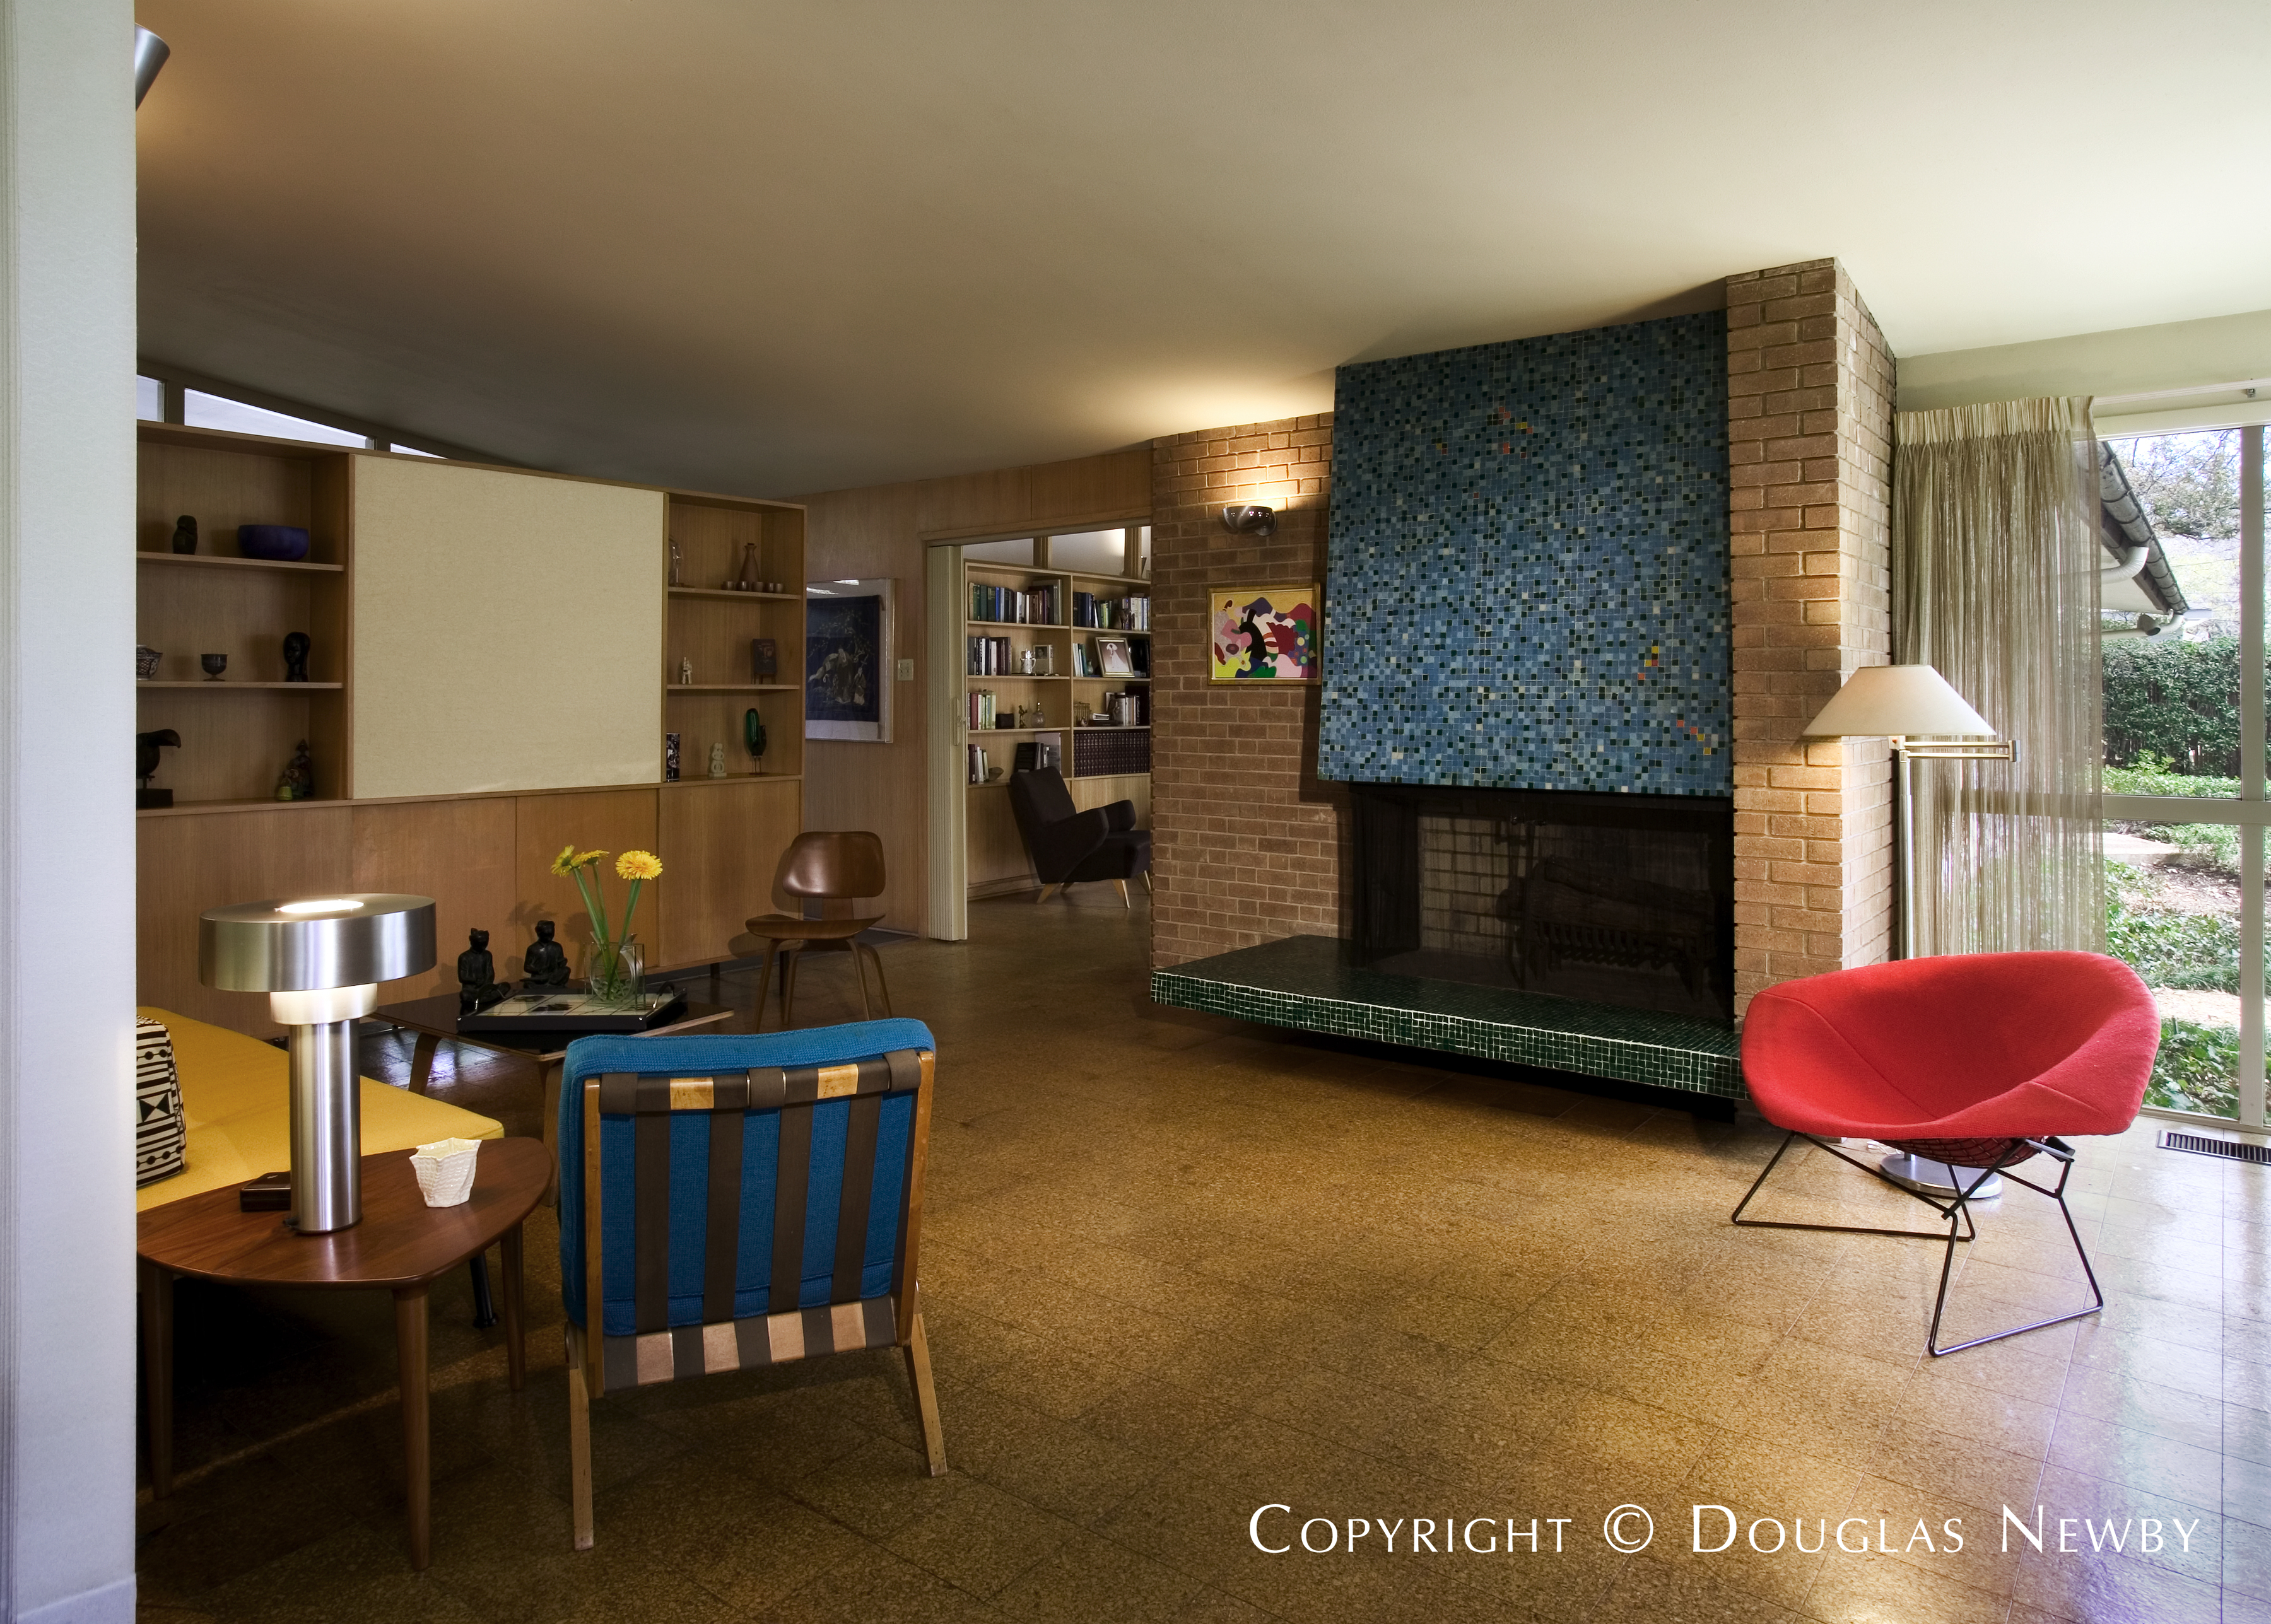 William Benson Mid-Century Modern Home built in the 1950s